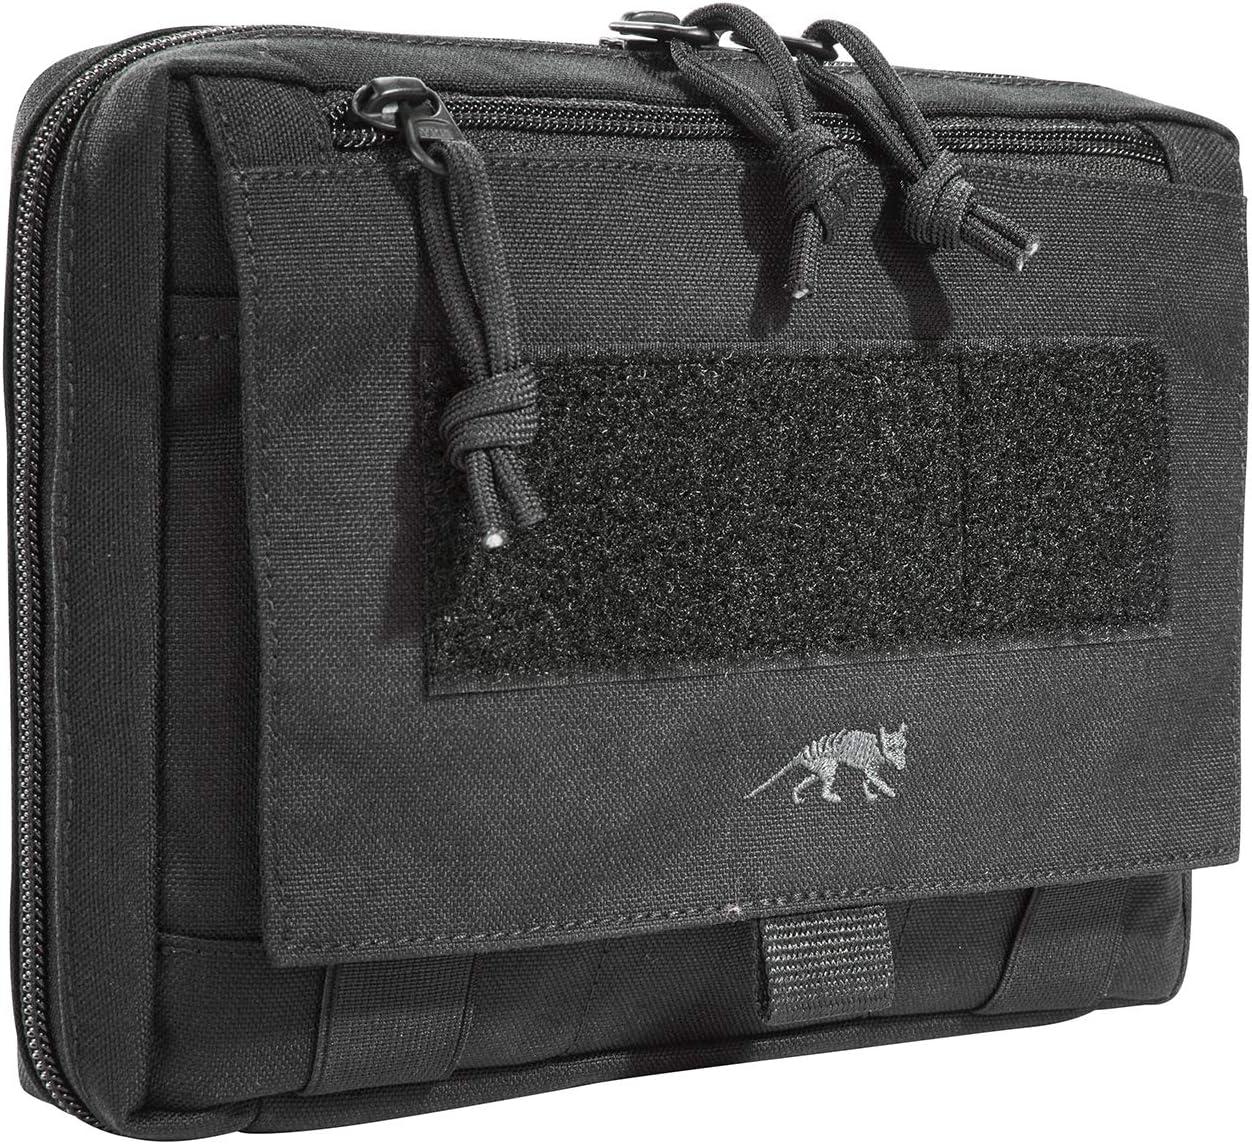 Bolsillo Adicional para Herramientas de Equipo Tasmanian Tiger TT EDC Pouch Organizador Compatible con Molle botiqu/ín de Primeros Auxilios; 20,5 x 16,5 x 4cm